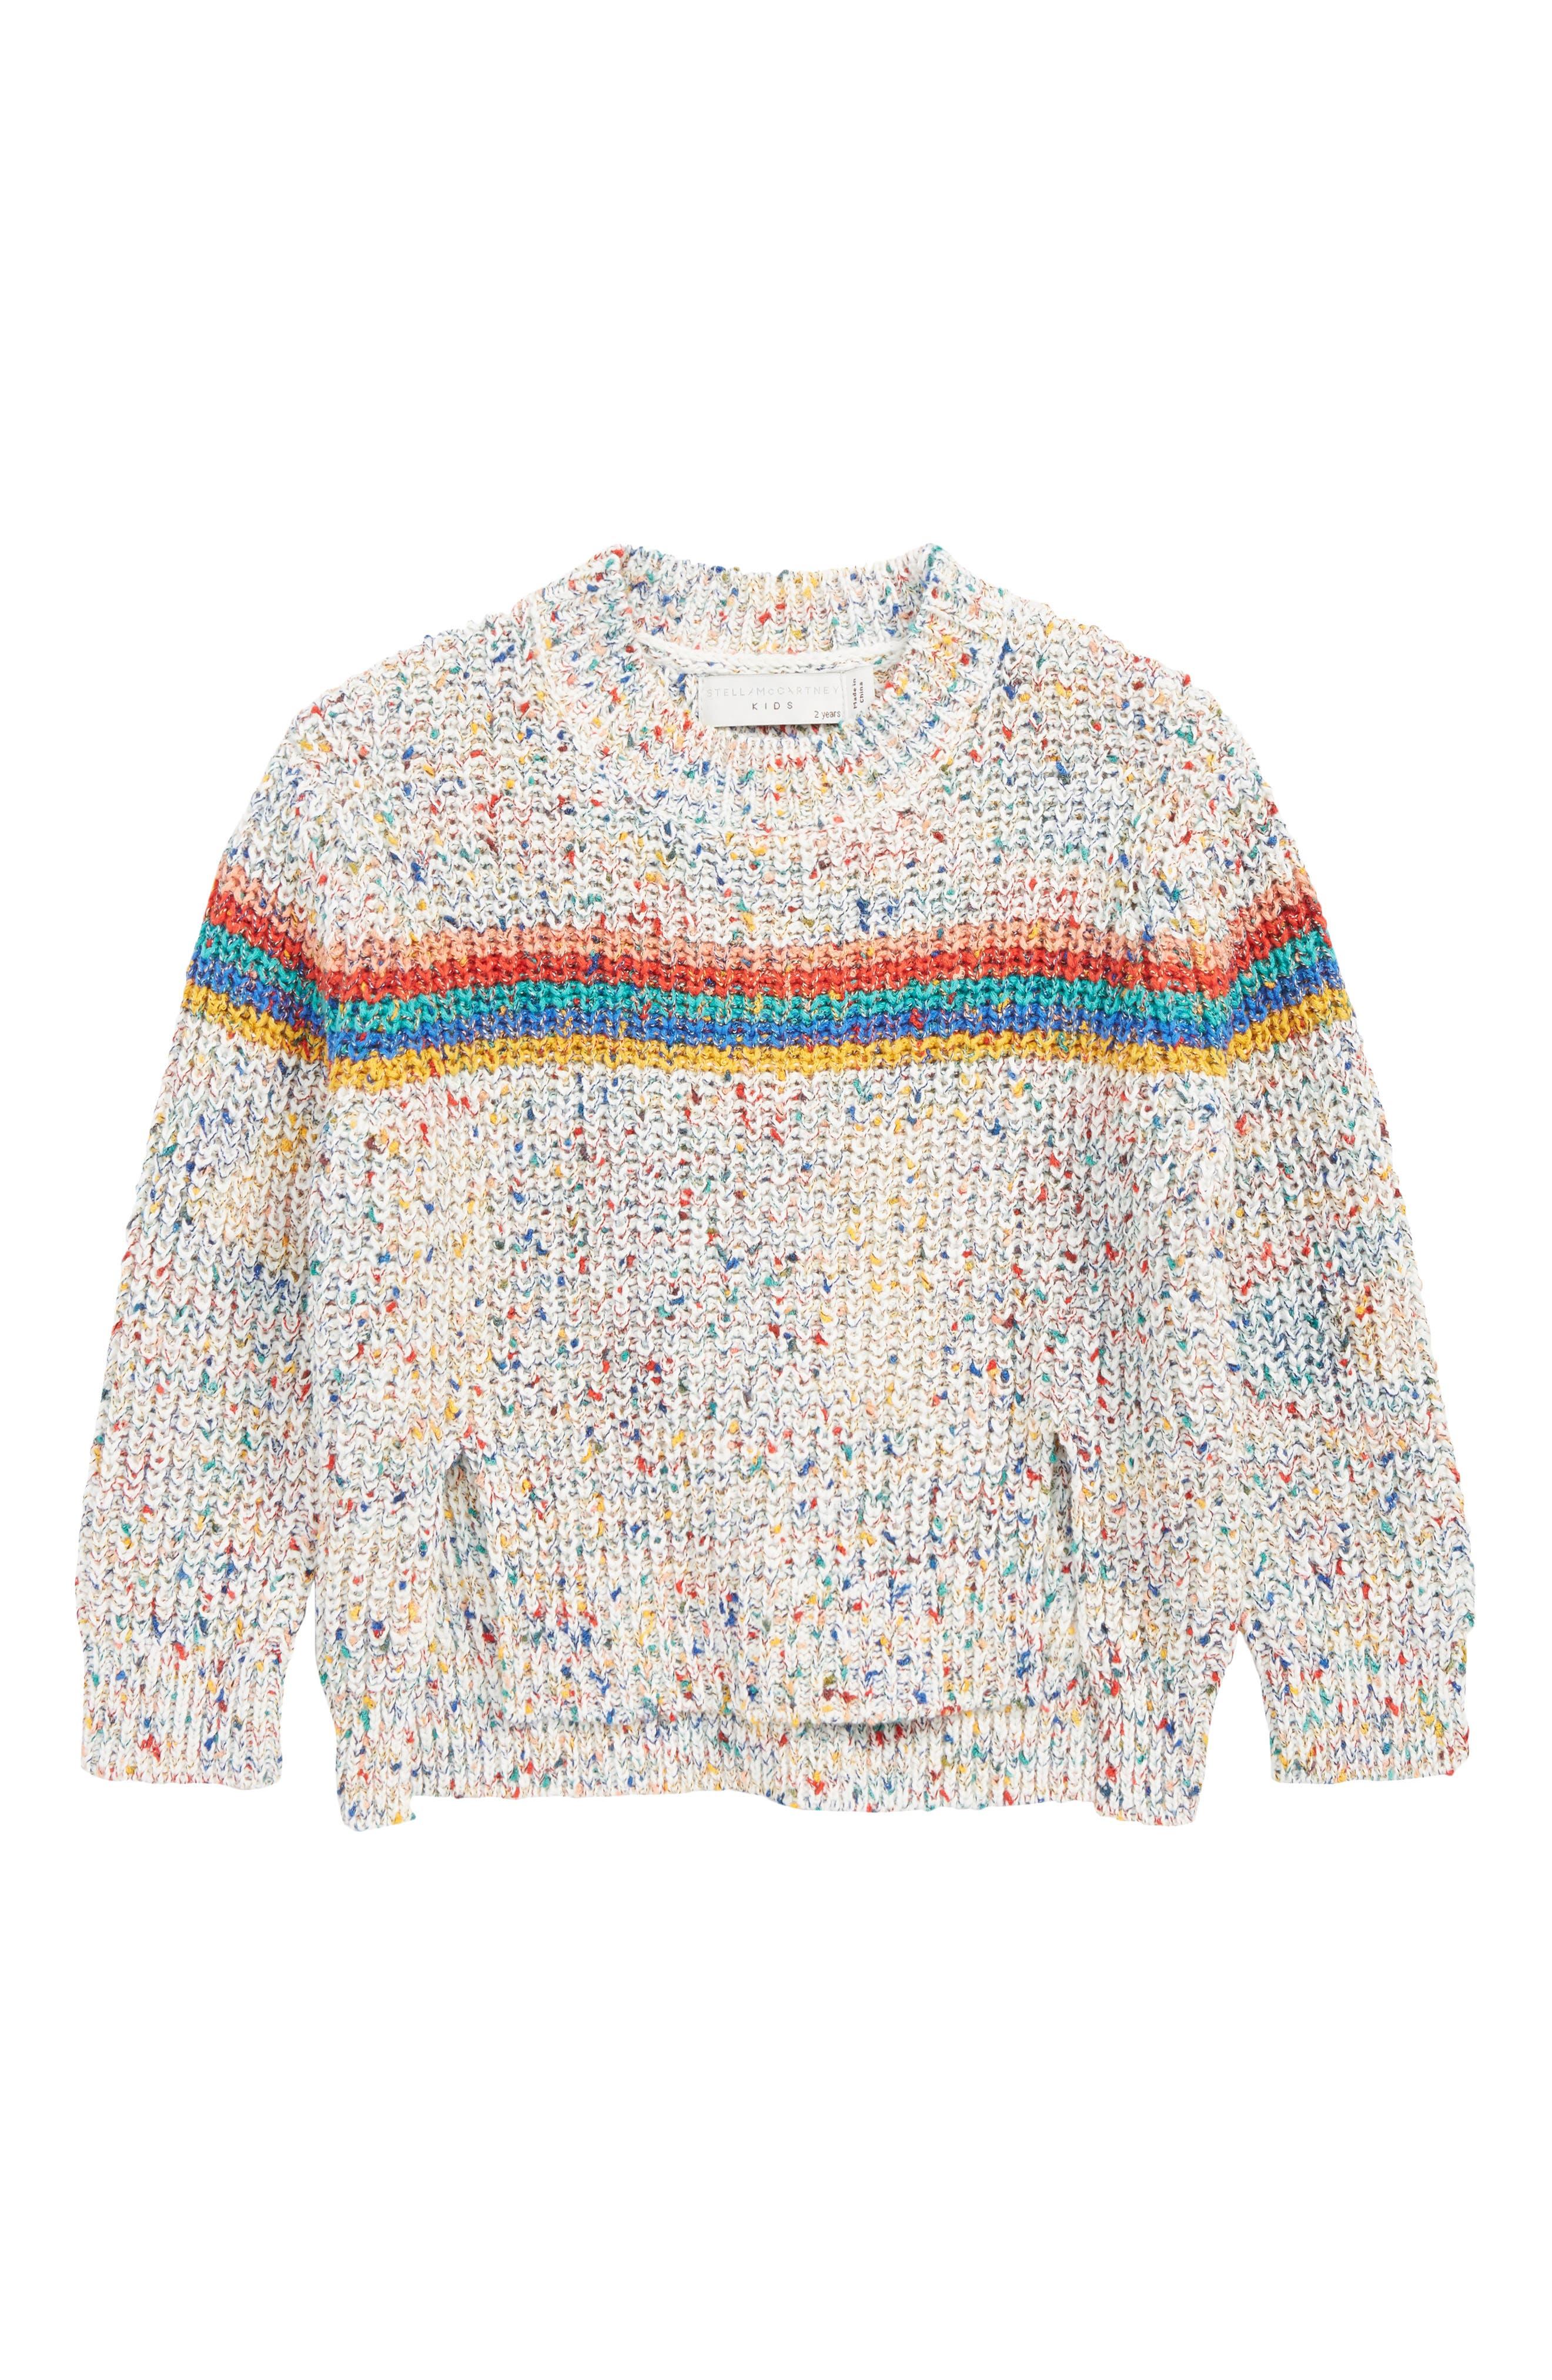 STELLA MCCARTNEY KIDS,                             Stella McCartney Rainbow Sweater,                             Main thumbnail 1, color,                             MULTI